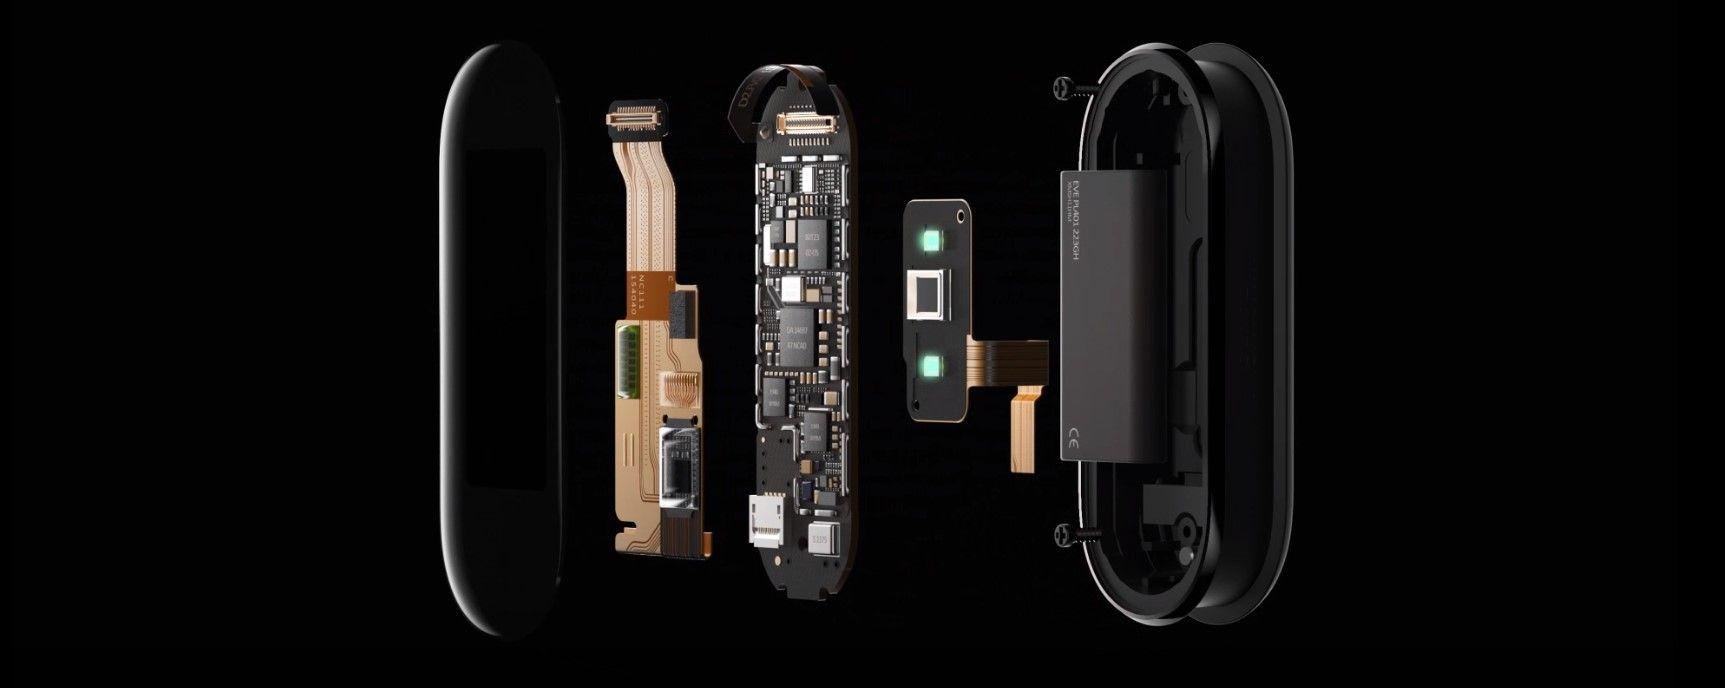 Xiaomi Mi Smart band 5 NFC 11 режимов